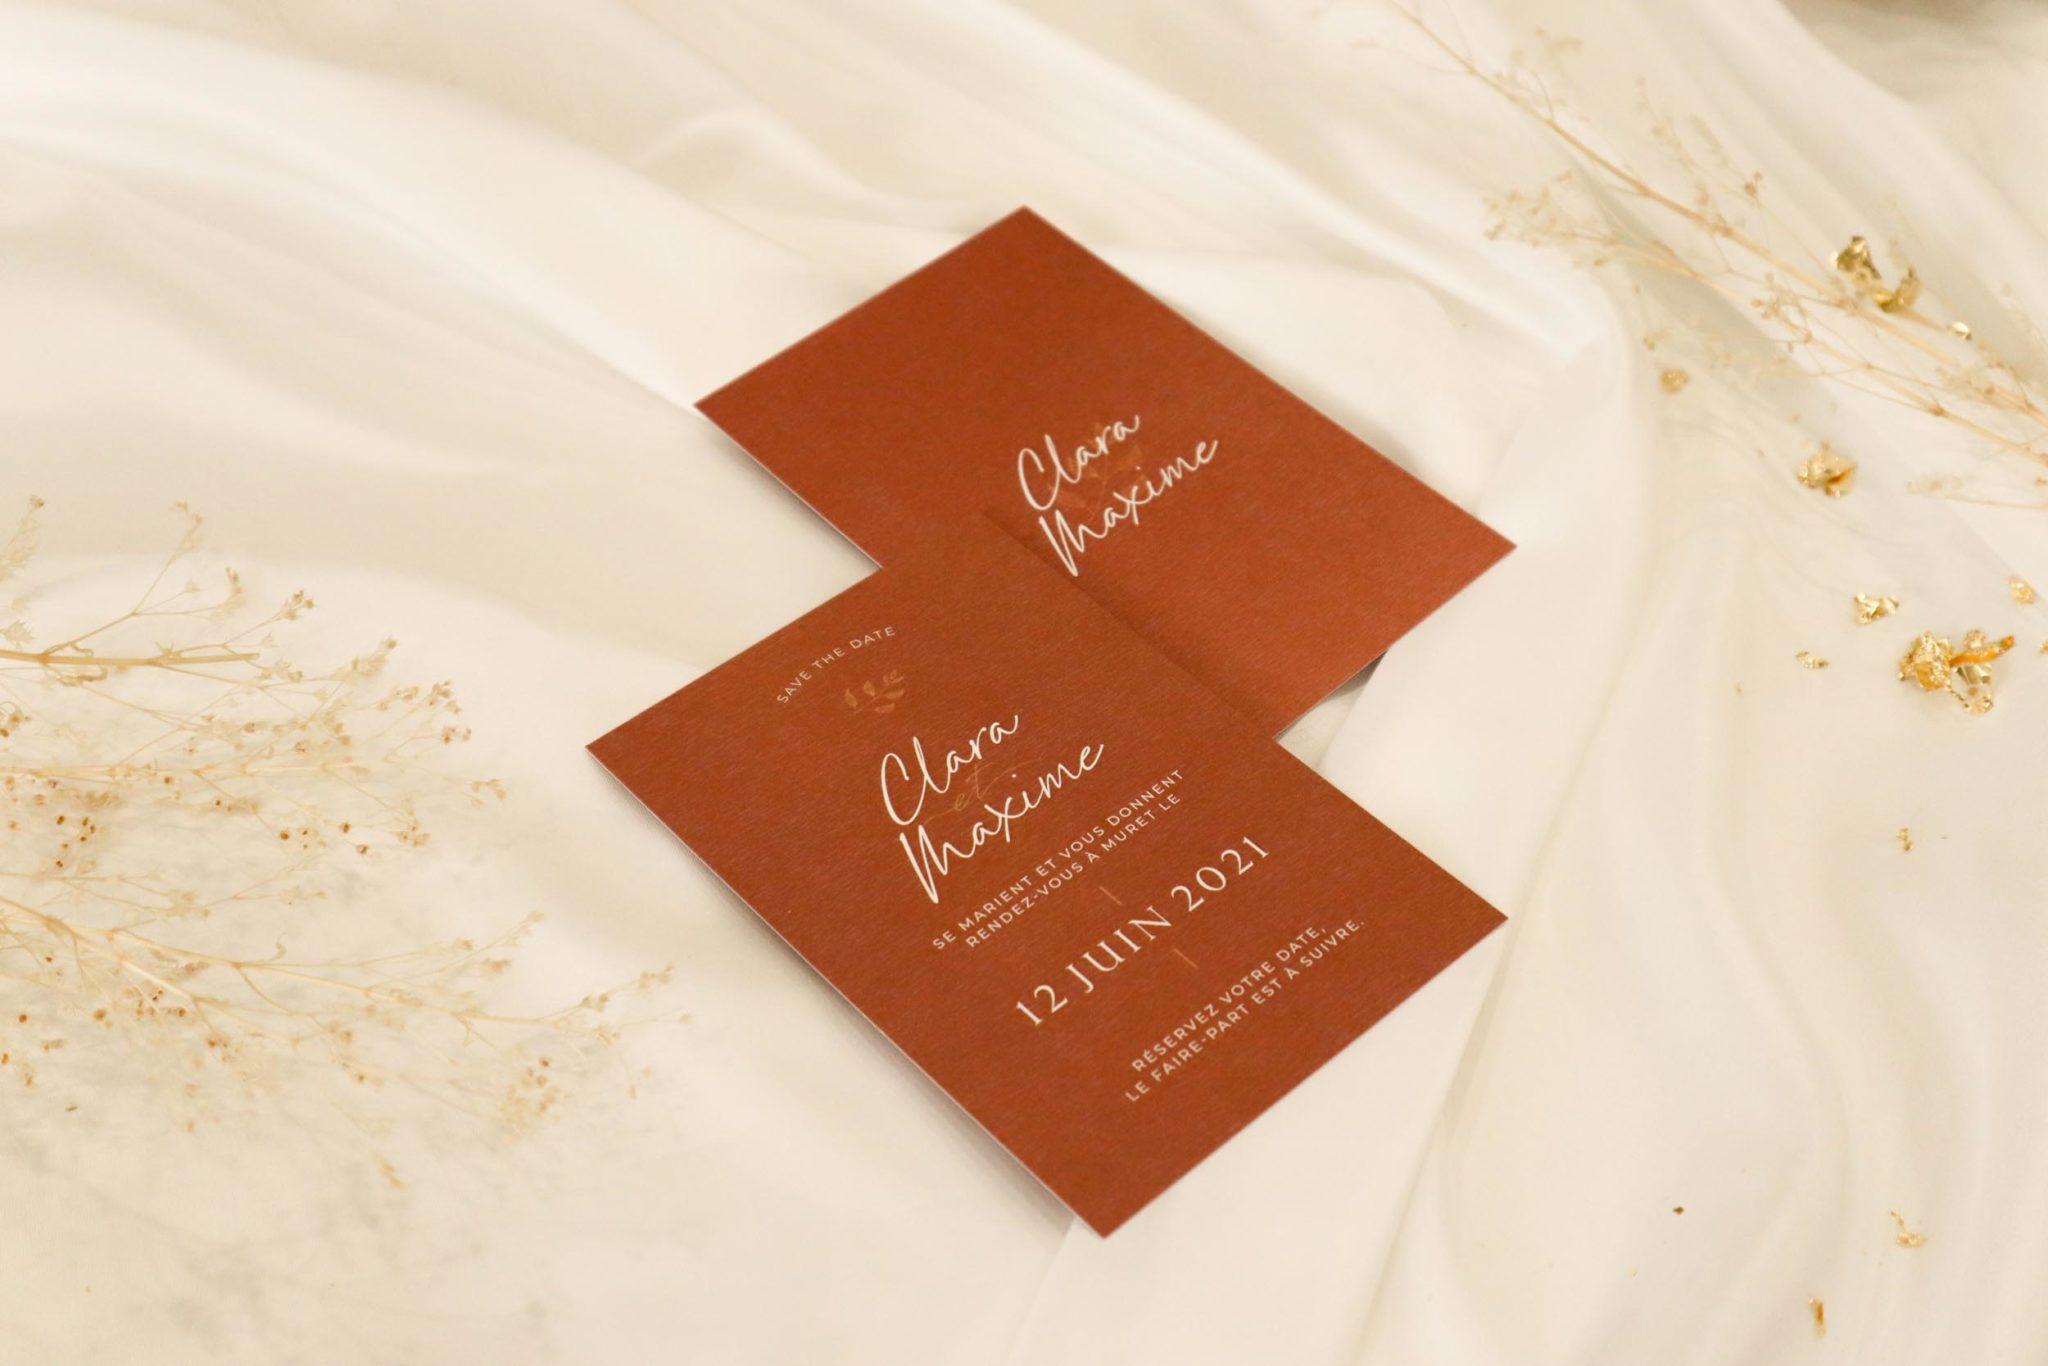 Save the date mariage terre de sienne terracotta marron nature boheme beige or